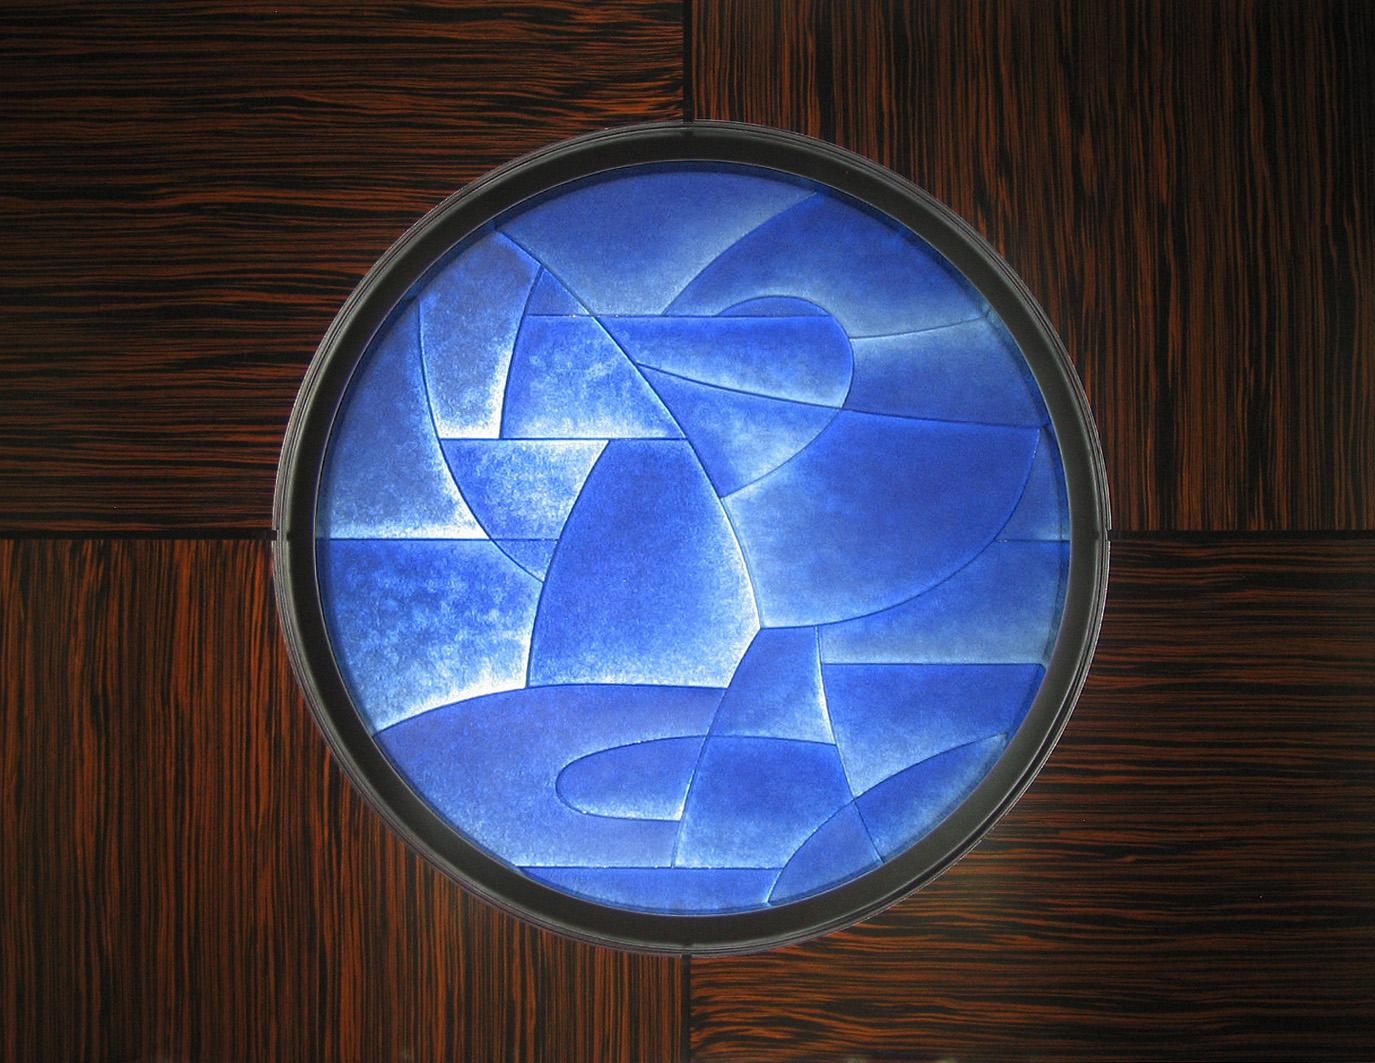 "Ocean    2007. Cast glass, aluminum. 50 x 50"" Private residence, Palm Beach, FL"